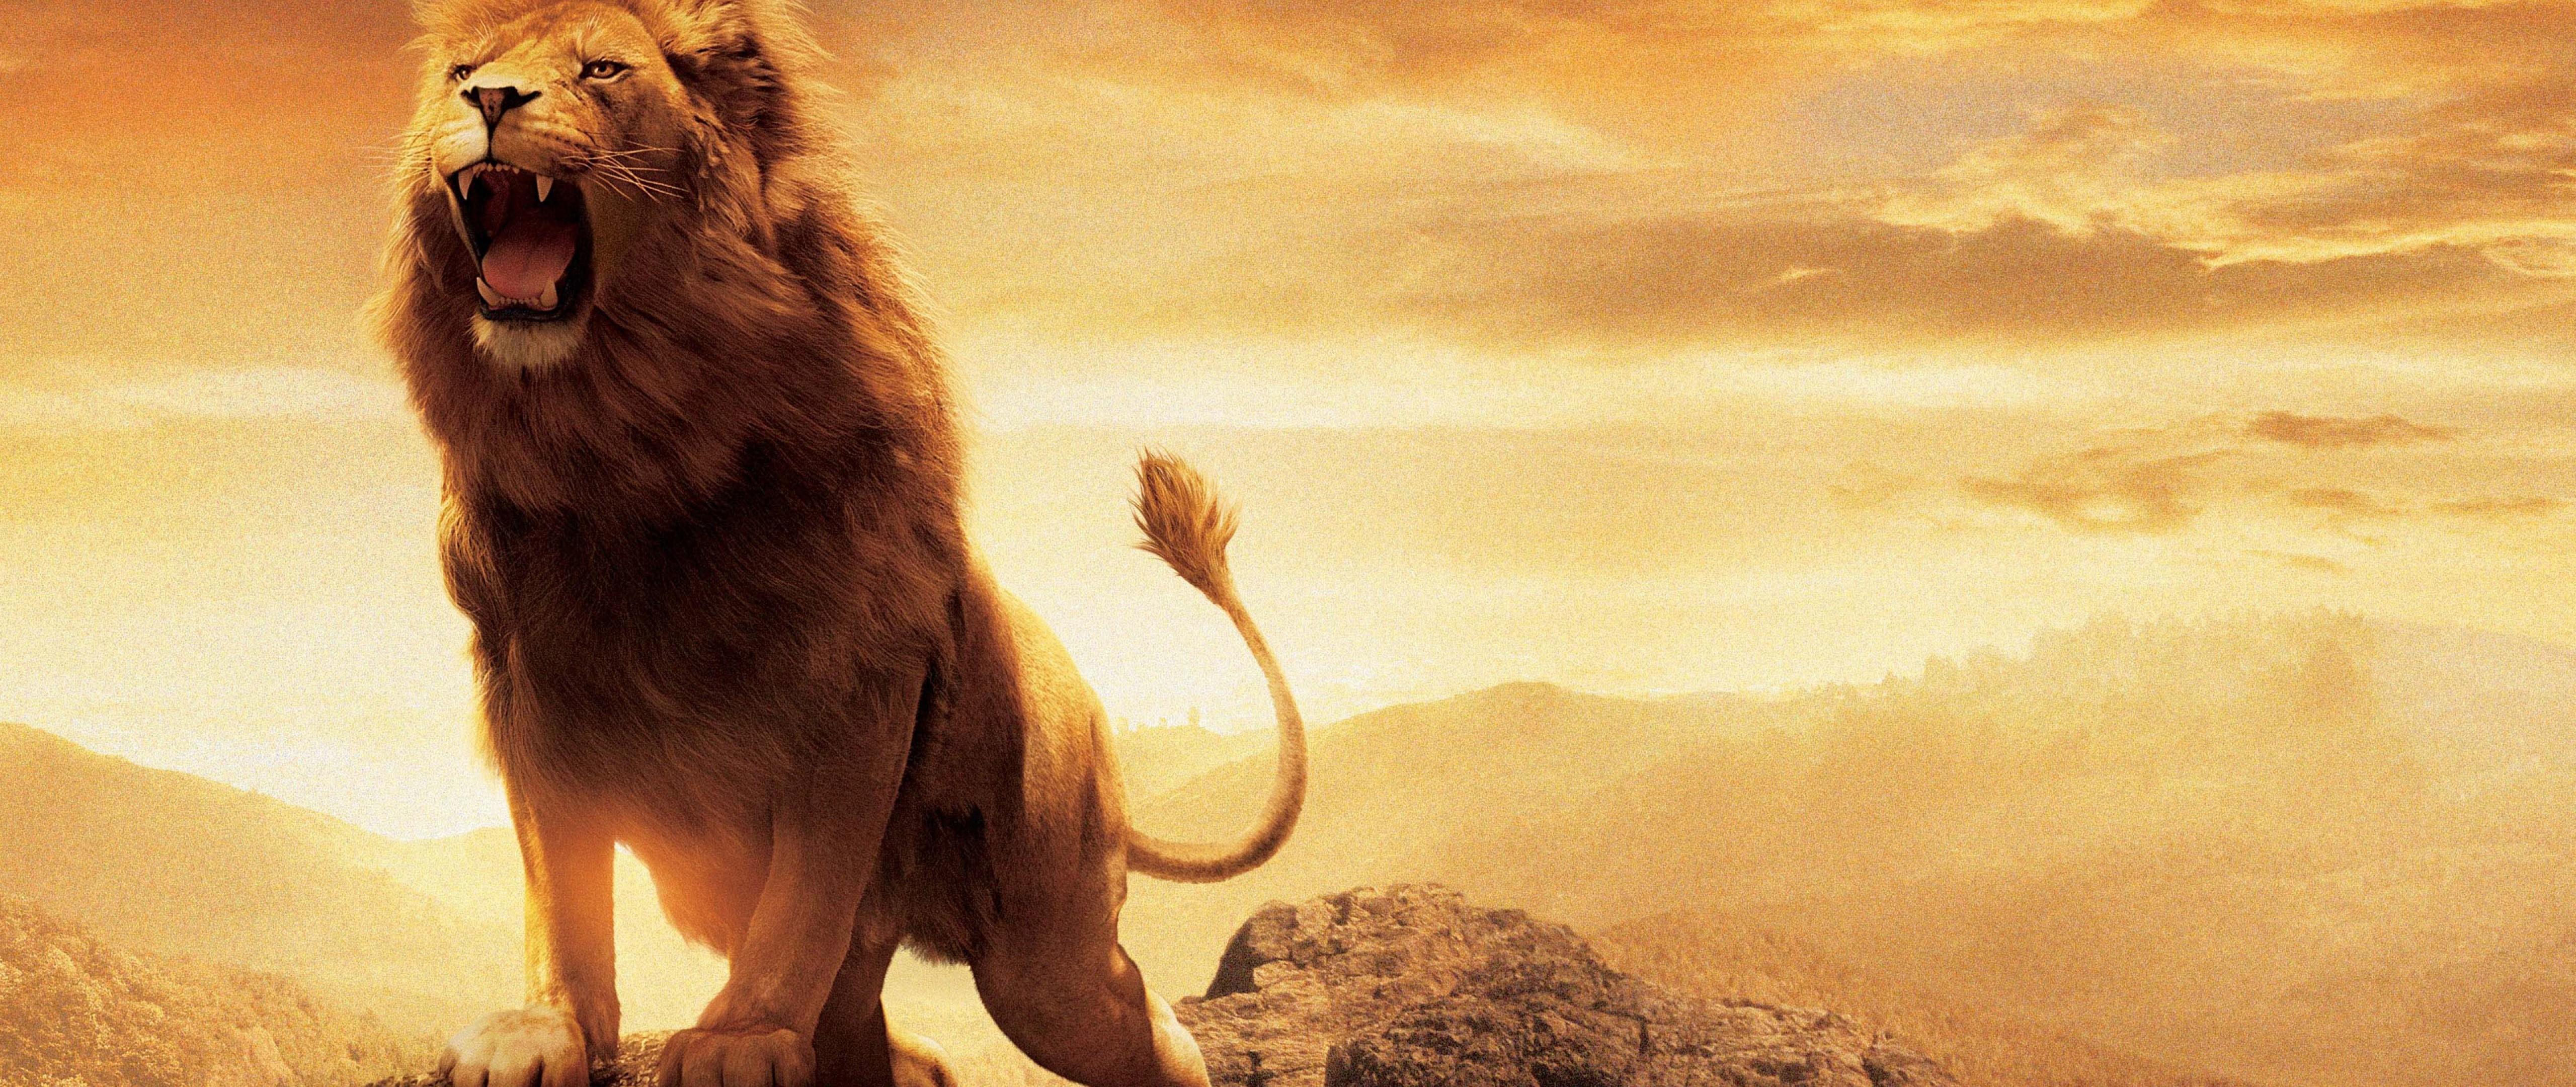 Aslan narnia lion hd wallpaper for desktop and mobiles 4k - Lion 4k wallpaper for mobile ...